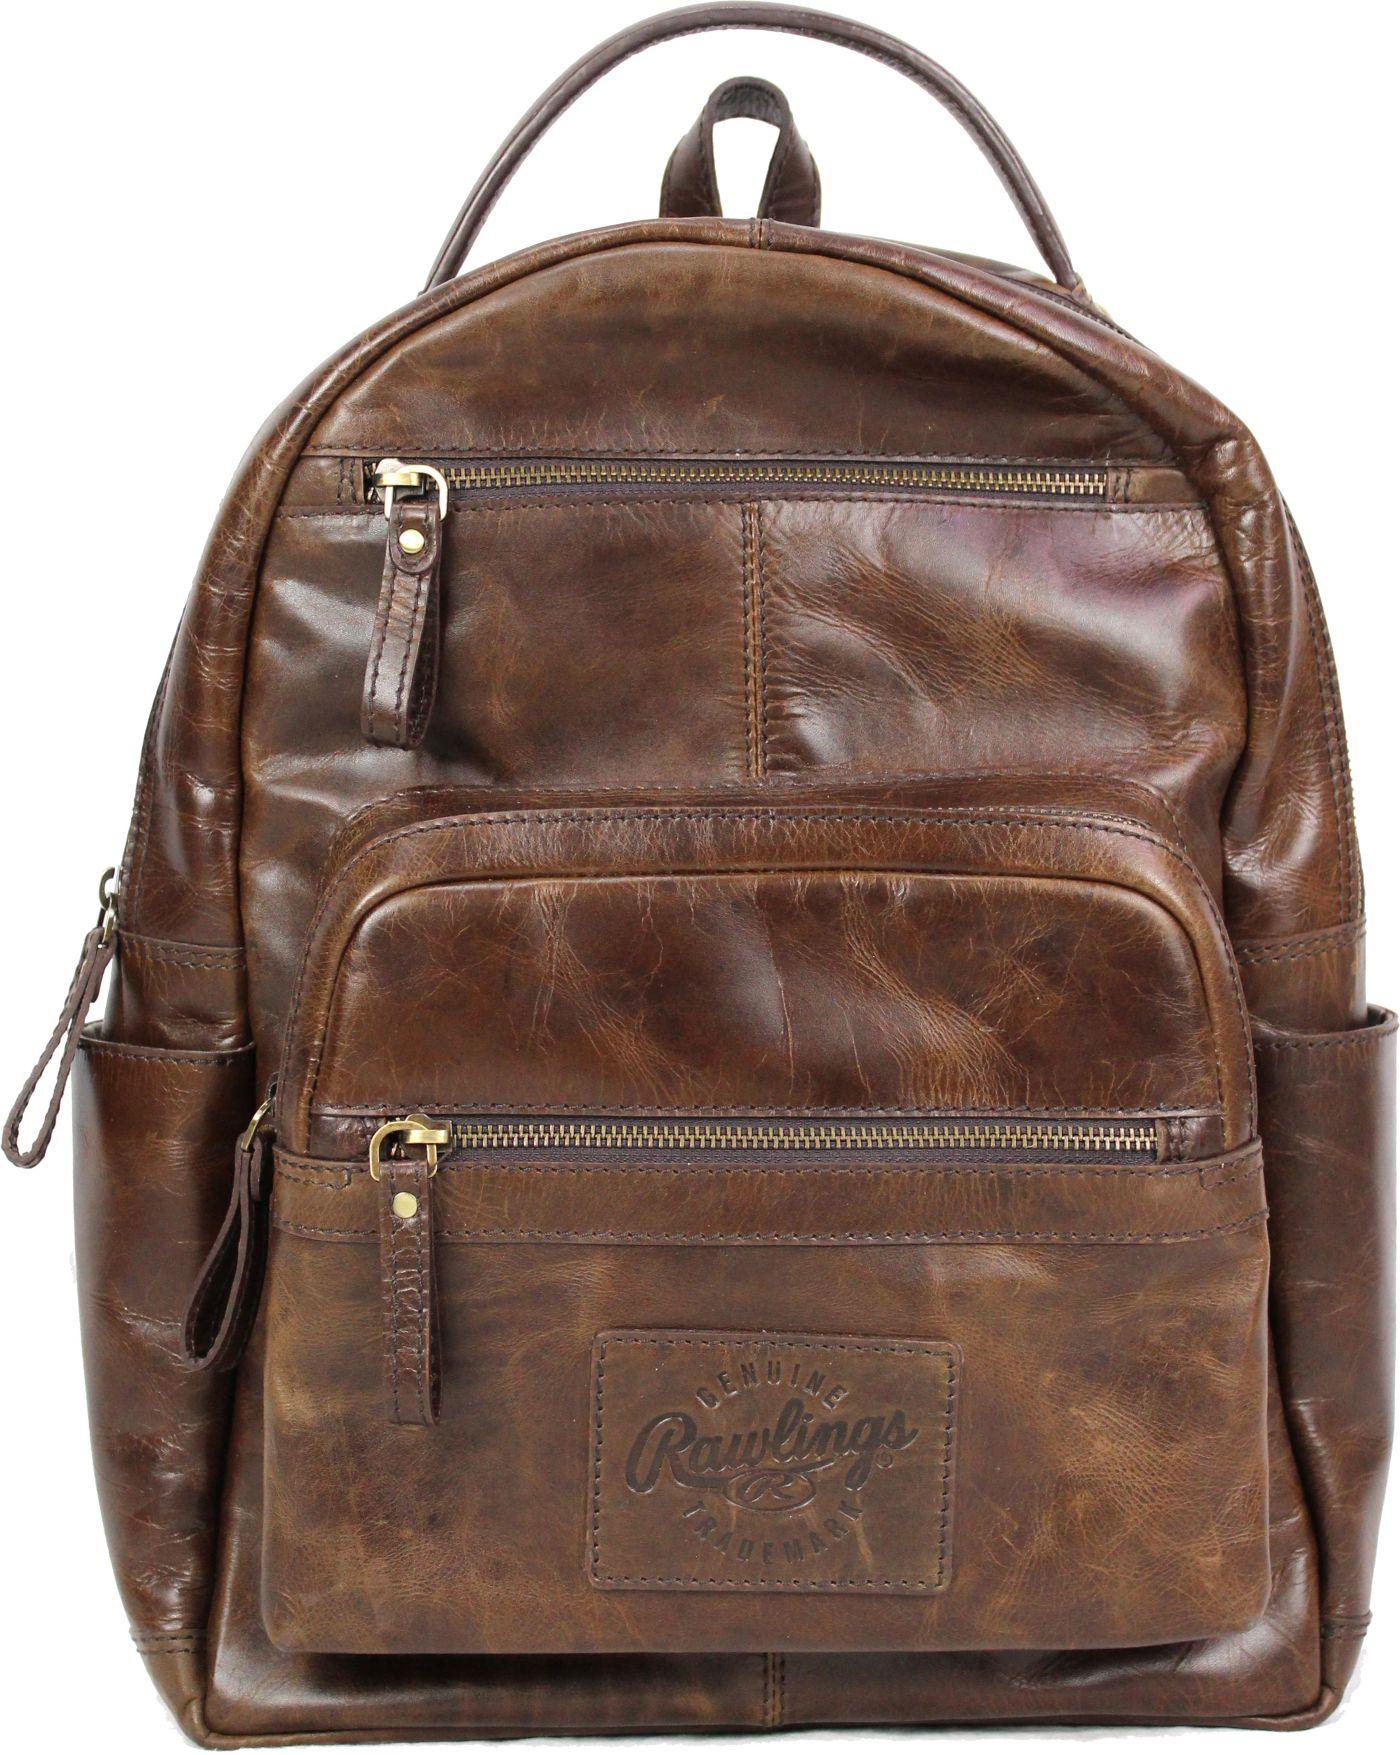 Rawlings Medium Leather Backpack